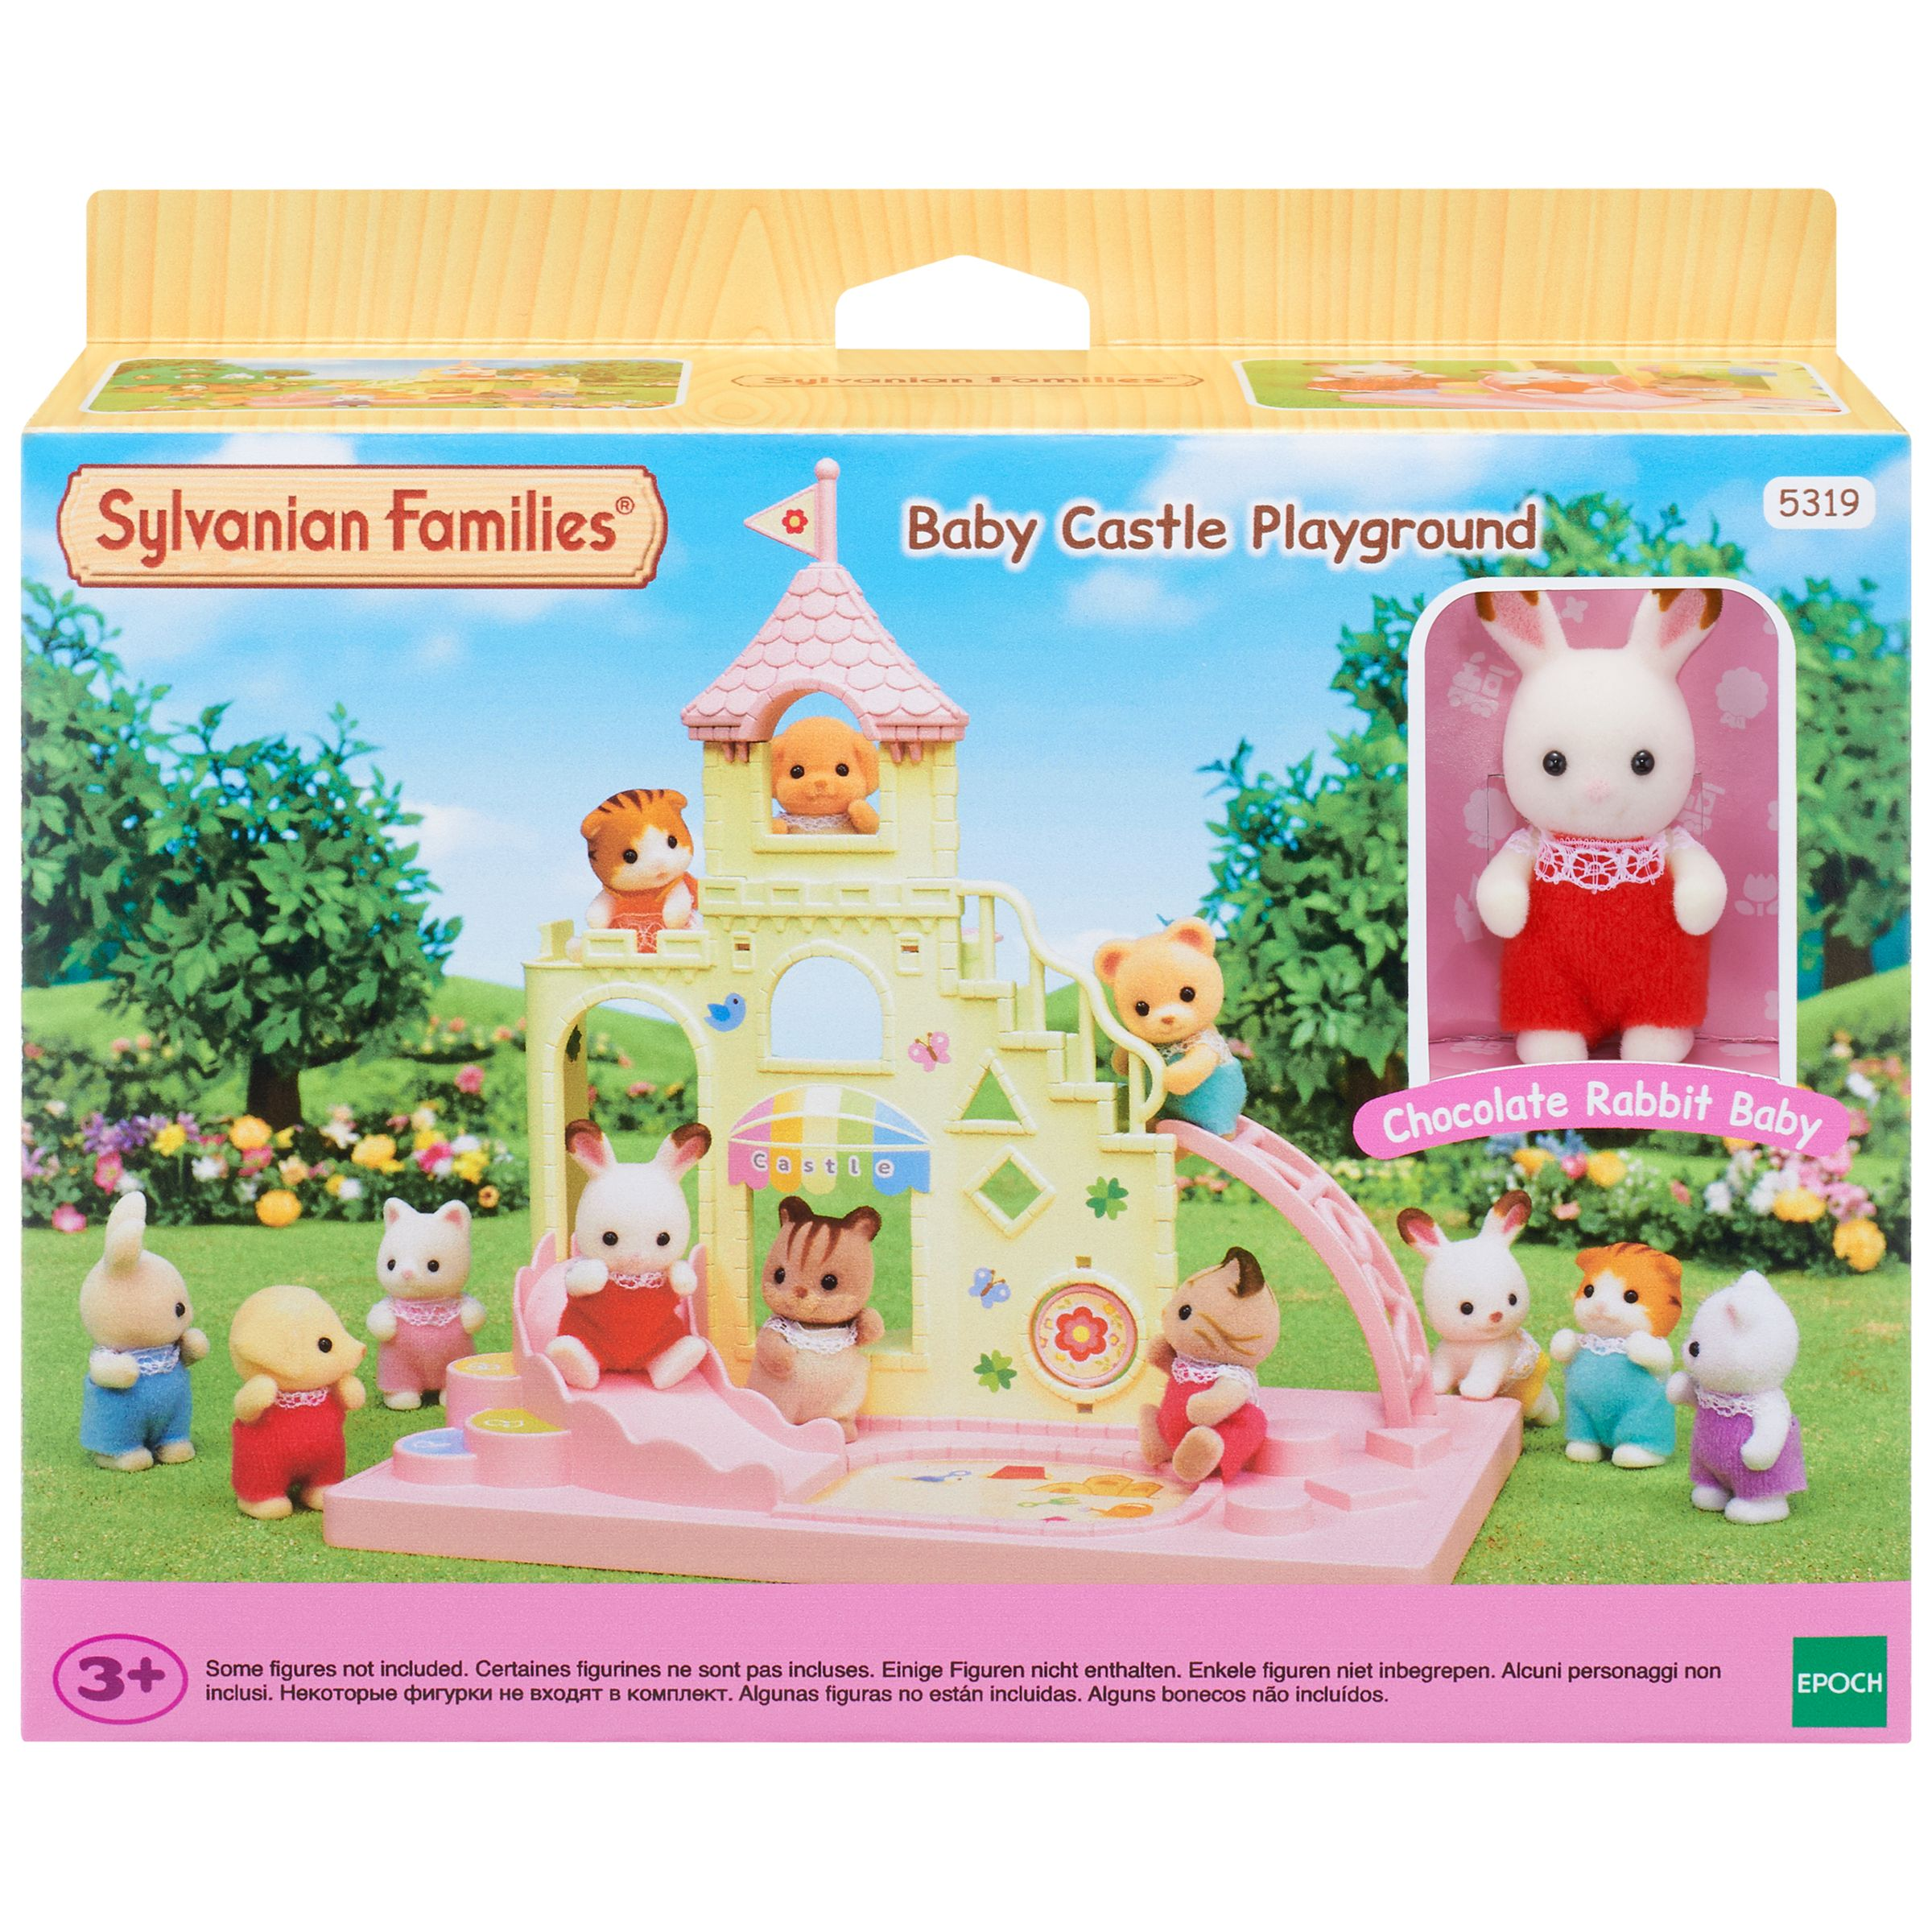 Sylvanian Families Sylvanian Families Baby Castle Playground